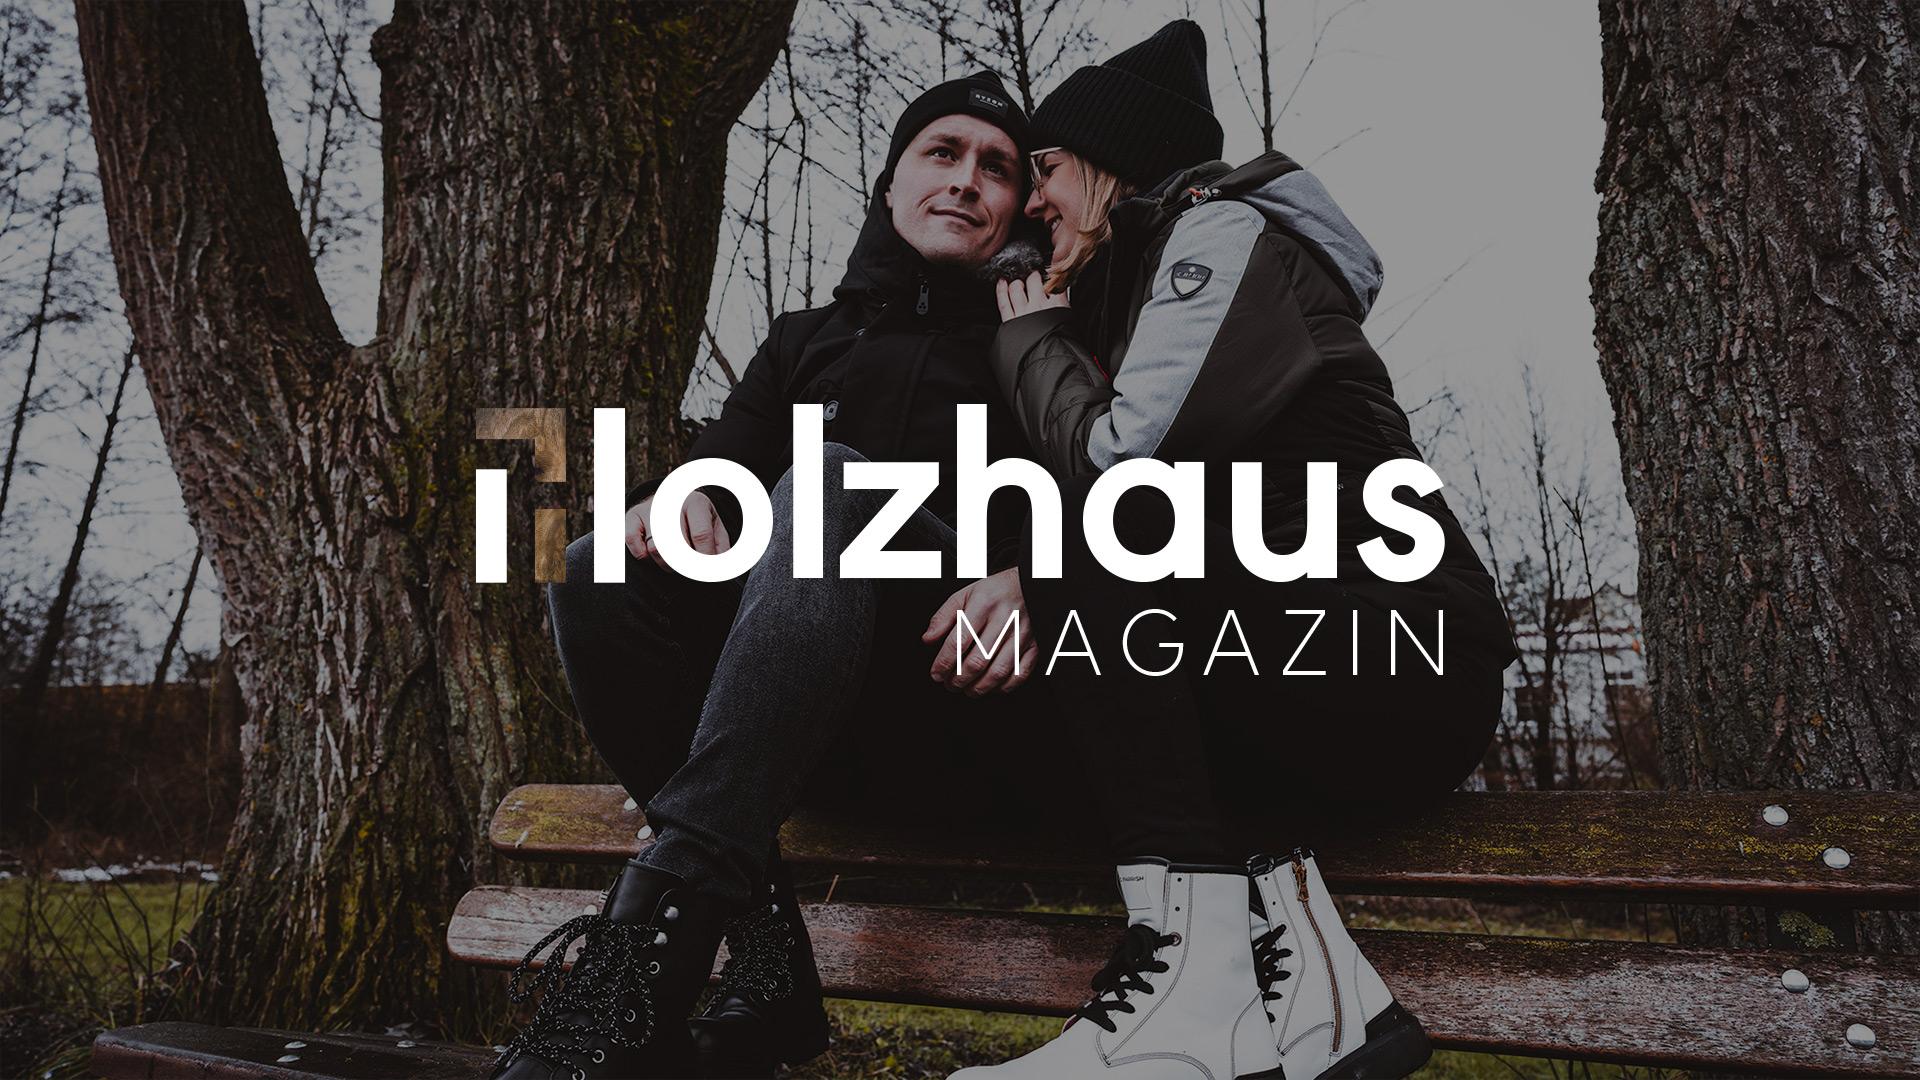 Holzhaus Magazin Header